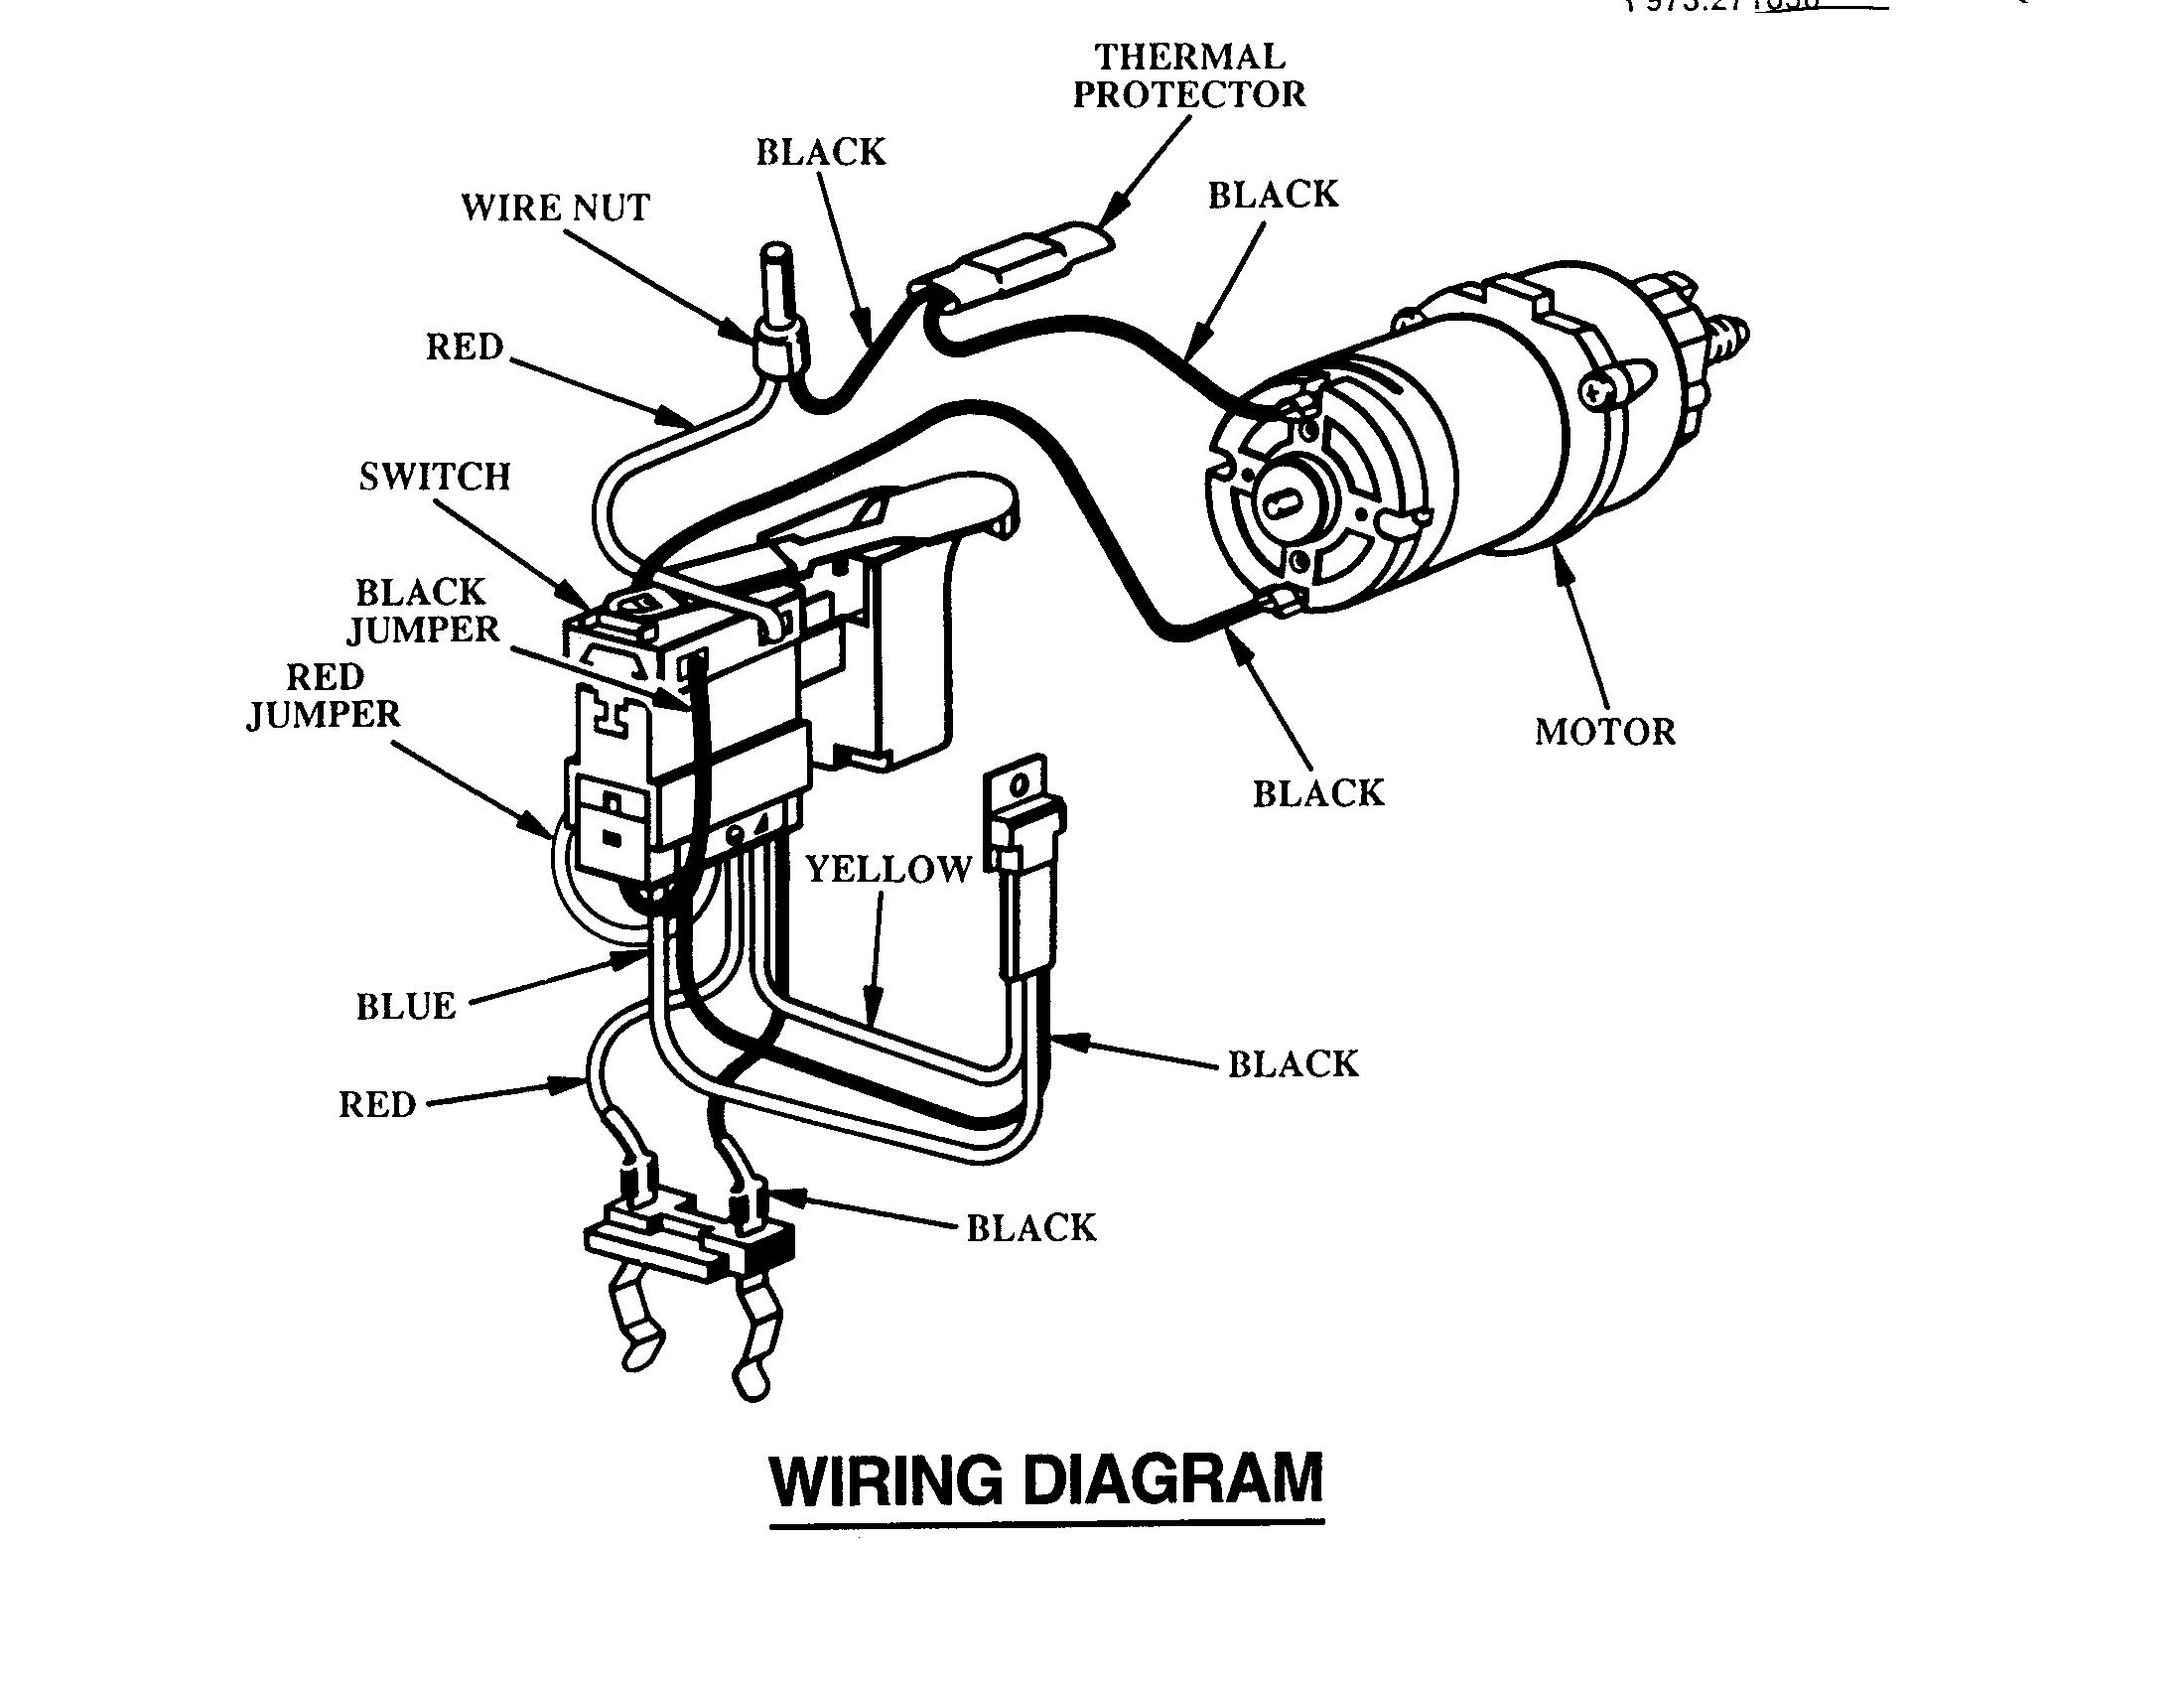 Craftsman model 973271830 drill driver genuine parts